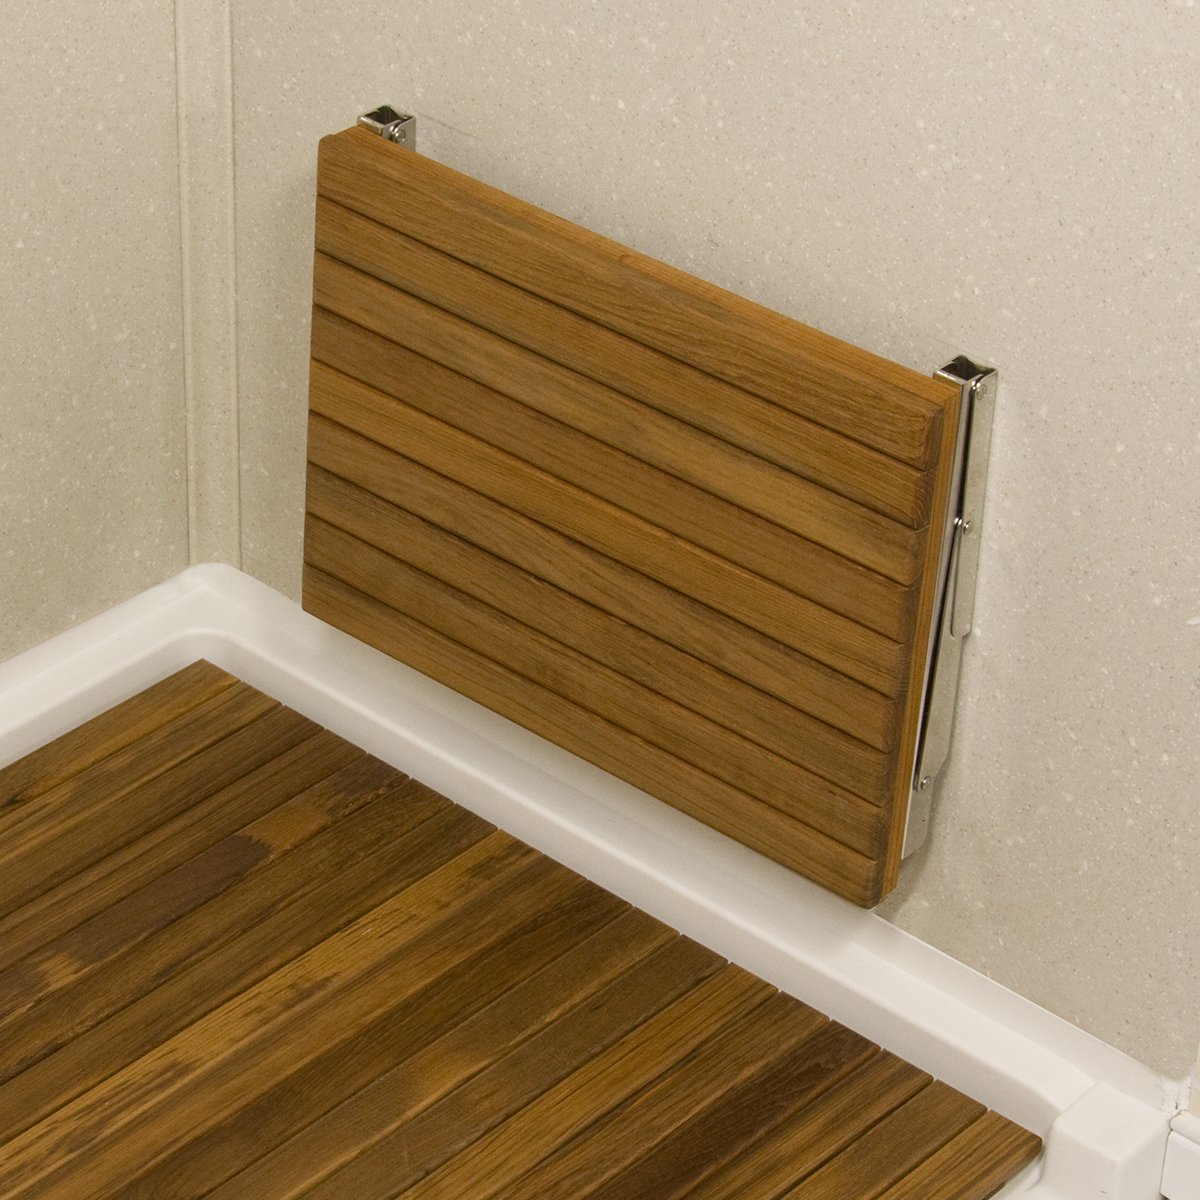 "Sale 17"" L x 12 1 2"" D Wall Mount Fold Shower Teak Bench"